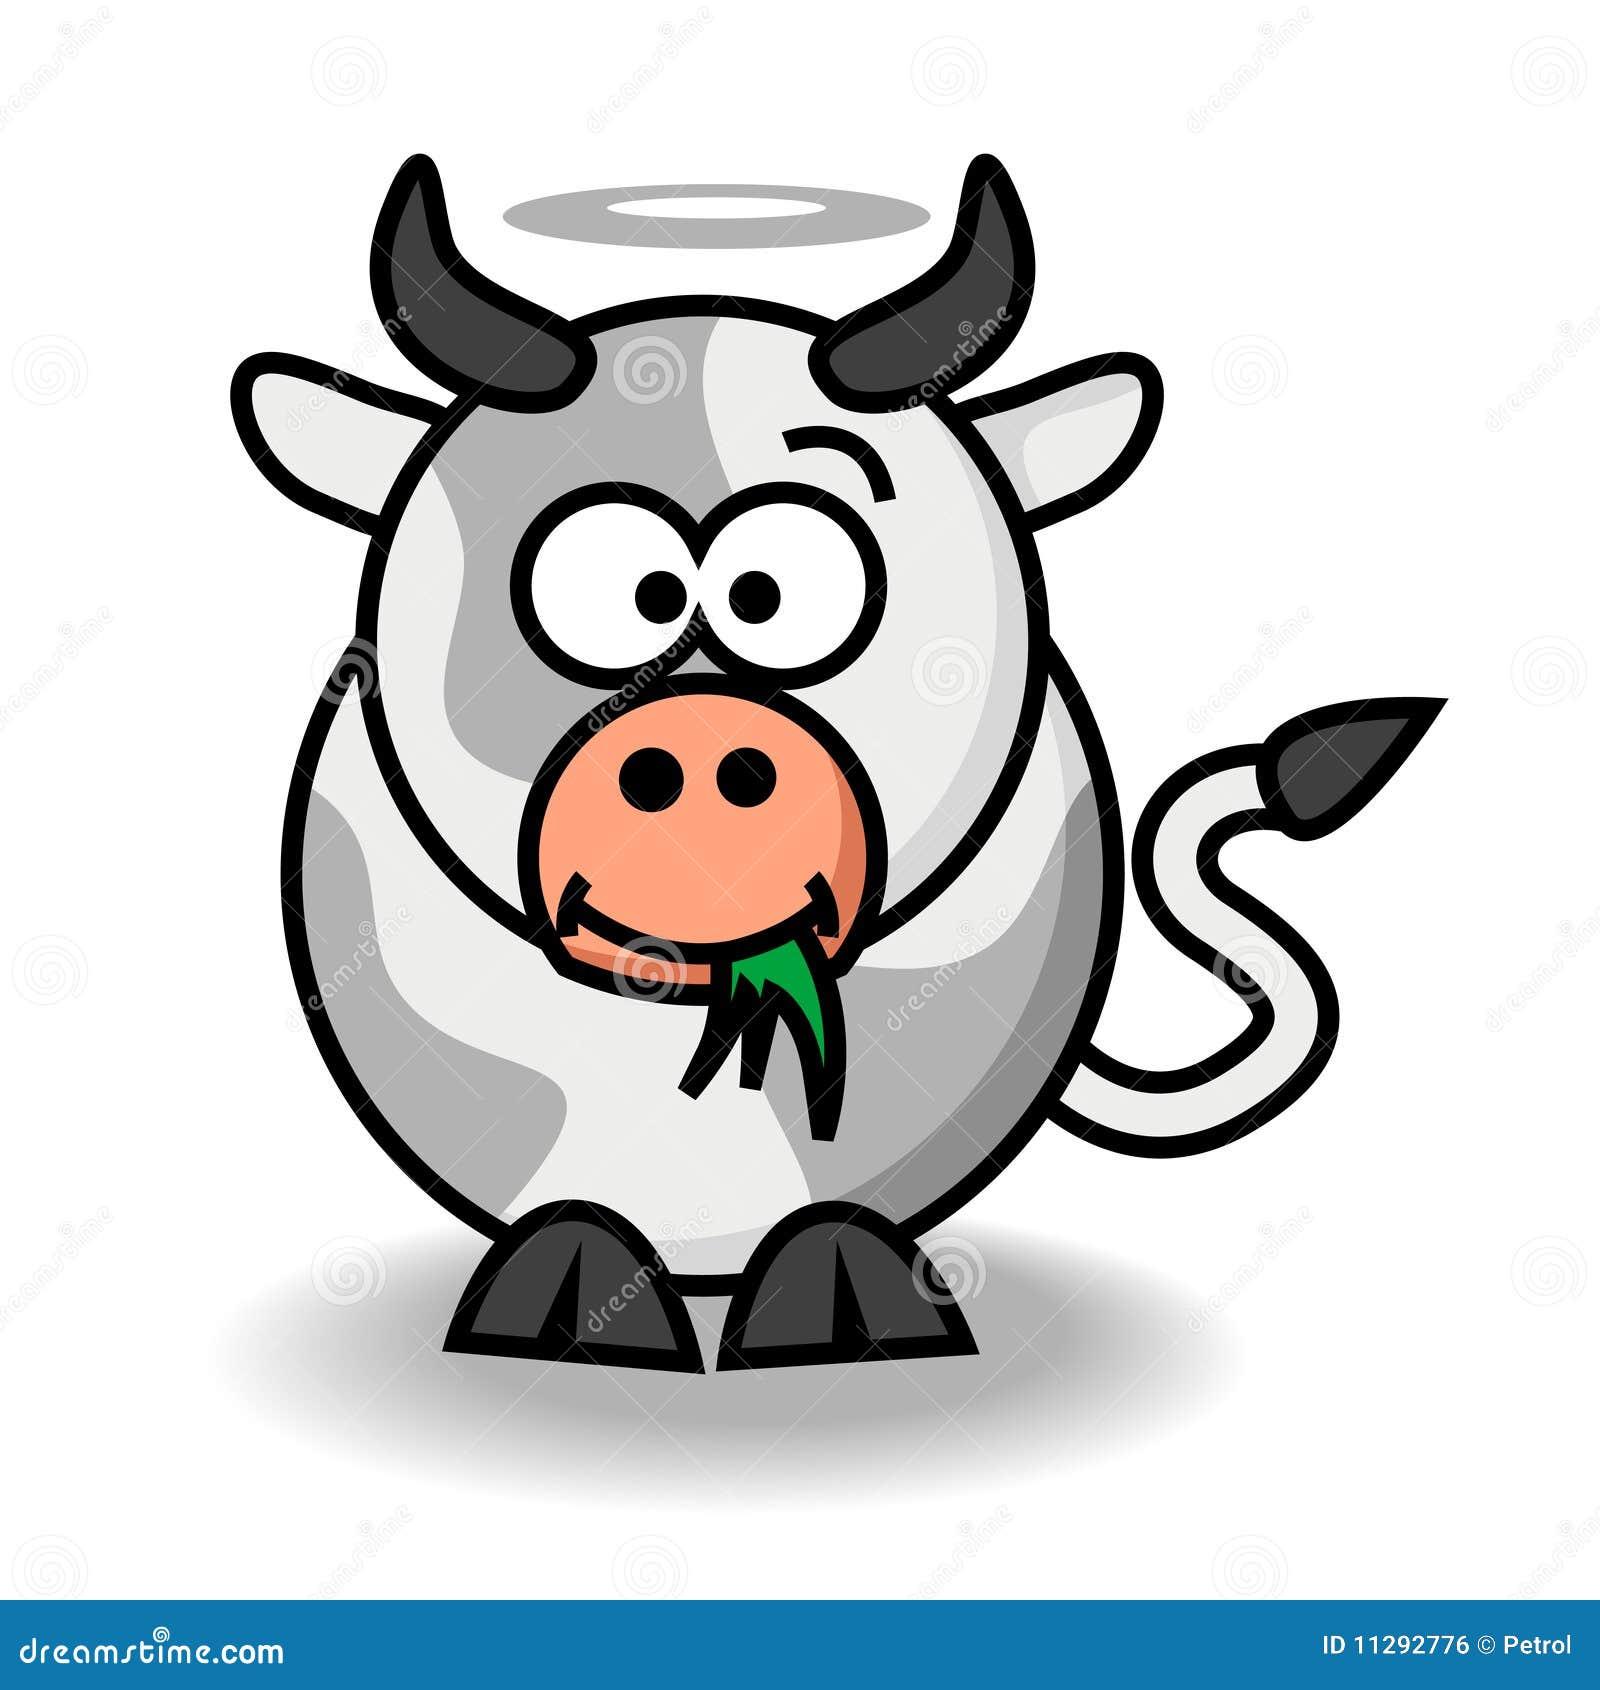 clip art holy cow - photo #9